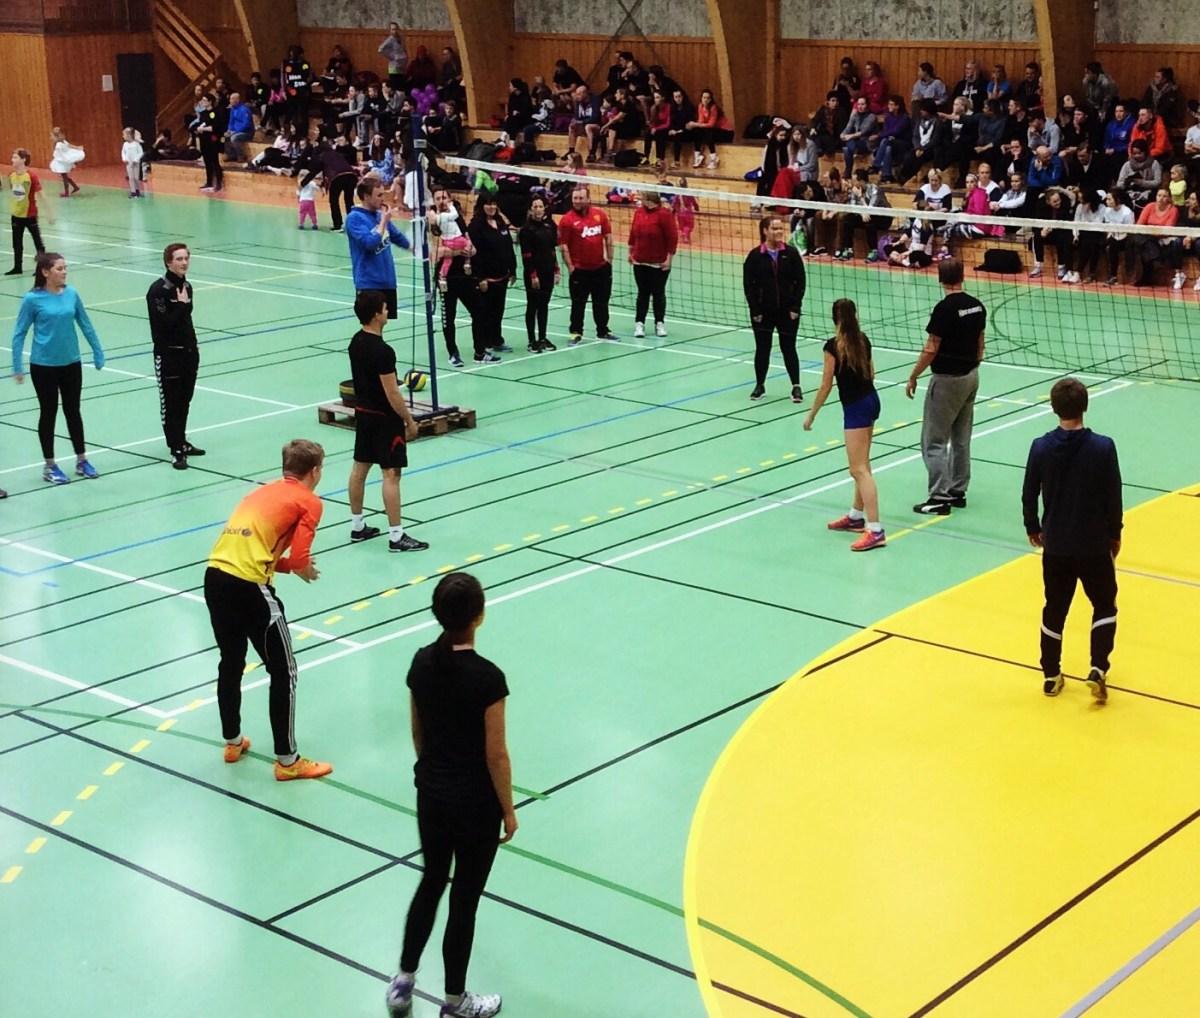 Fotball, volleyball og Frostamesterskap i kaldkauking, rævkrok og potetløp!